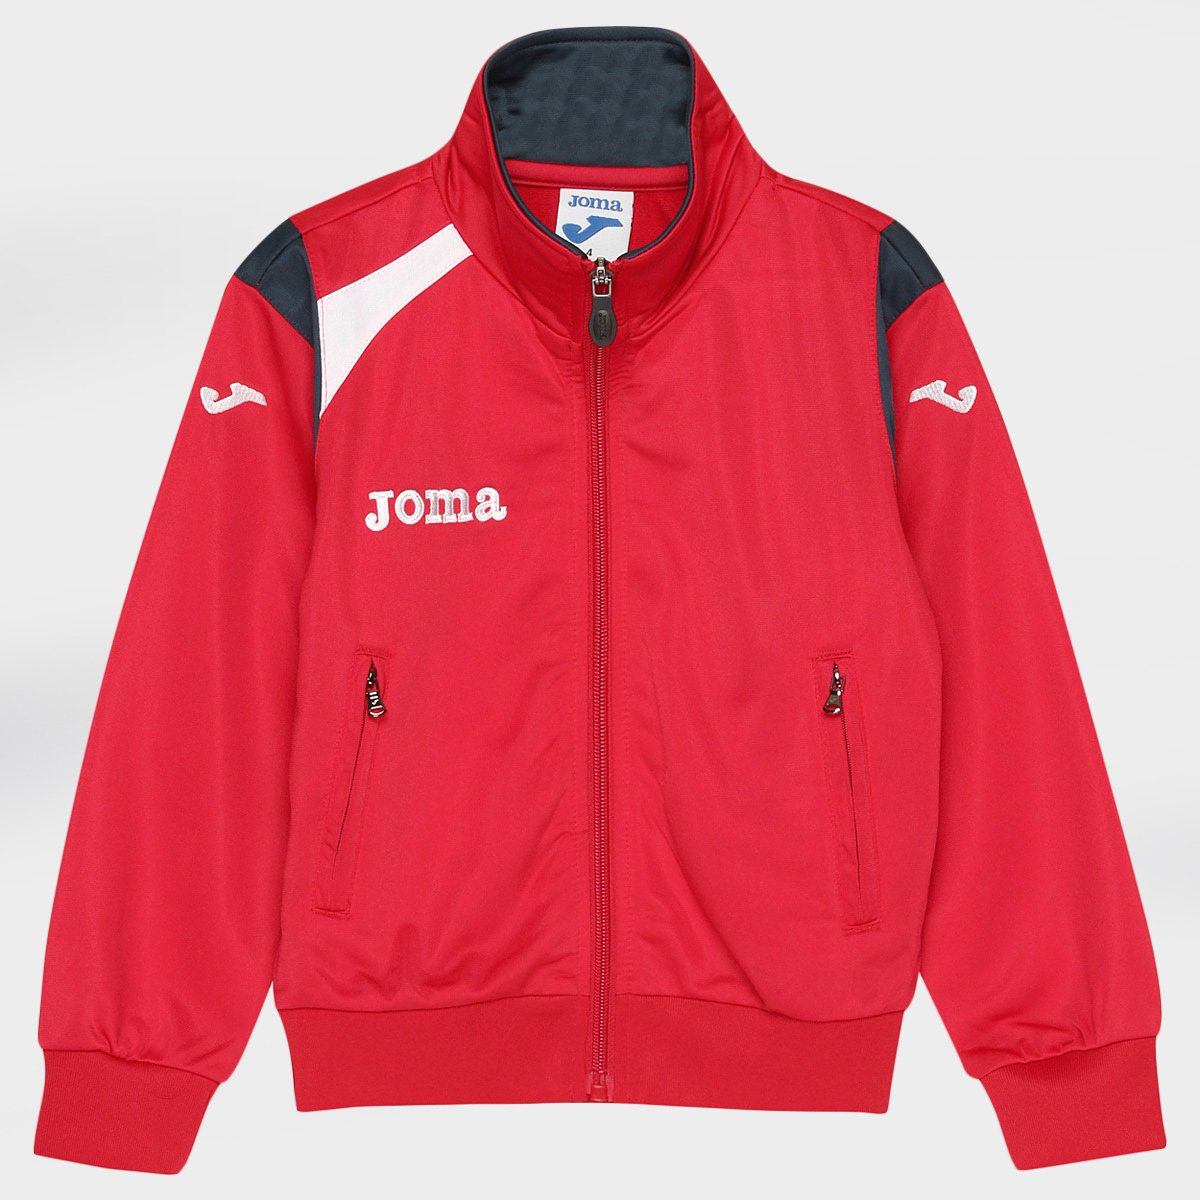 4e0fead544 Jaqueta Infantil Joma Escudo - Compre Agora